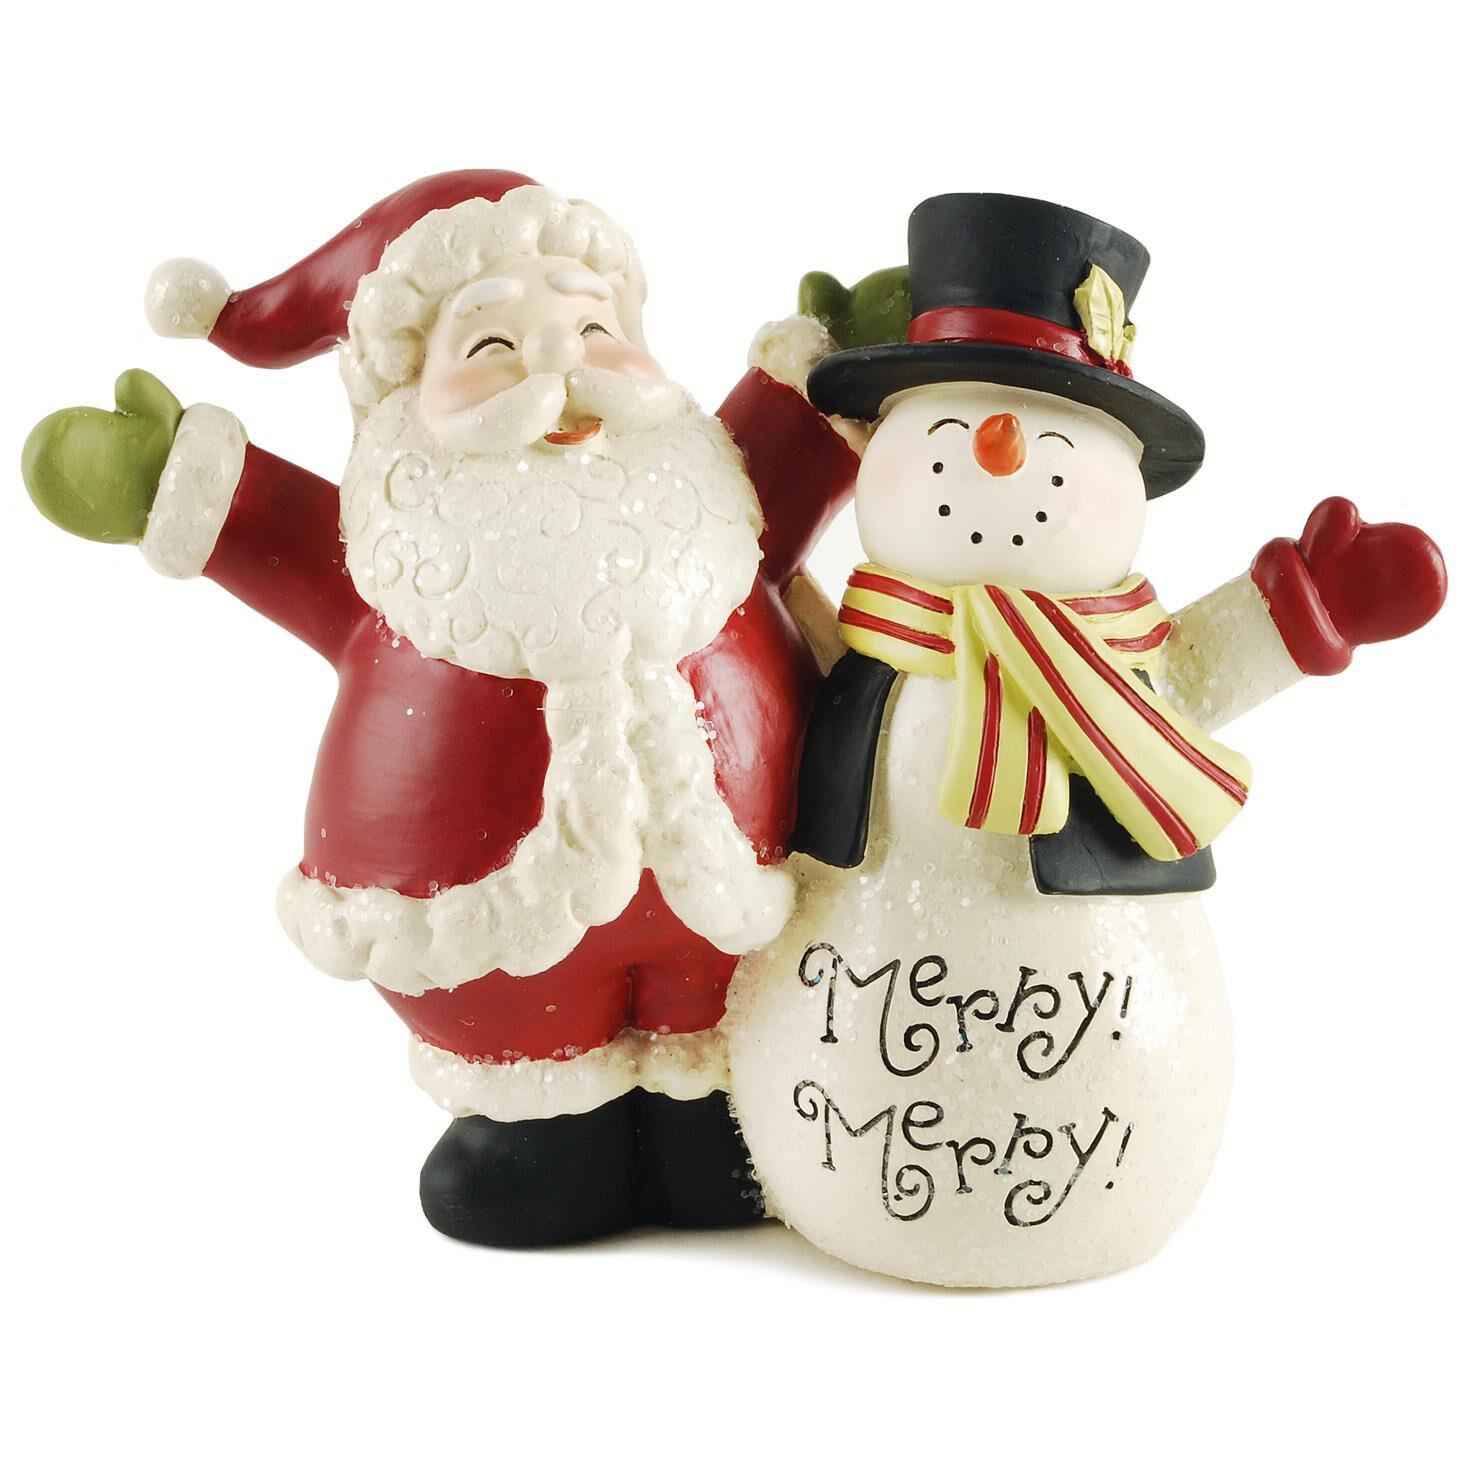 santa and snowman figurine figurines hallmark - Santa And Snowman